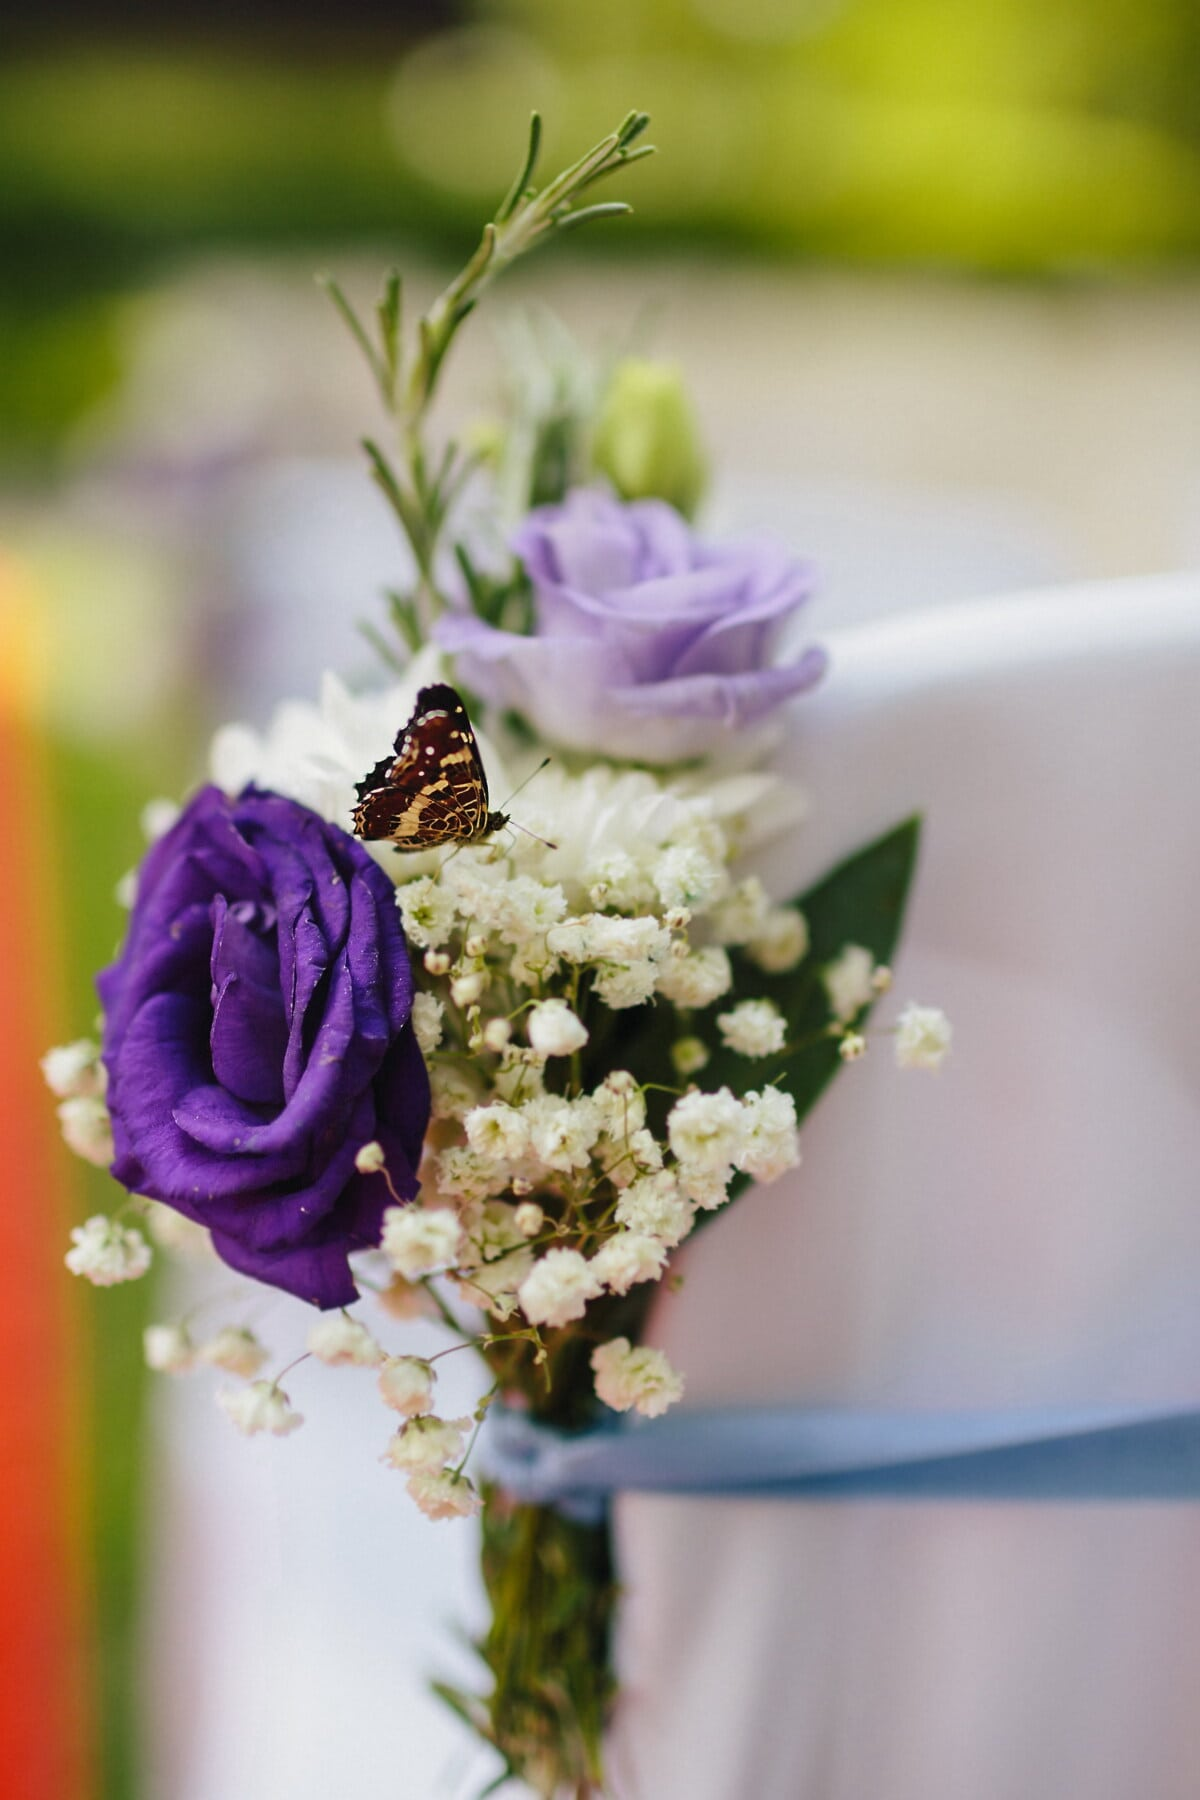 wedding bouquet, butterfly, decoration, purple, rose, flower, bouquet, wedding, flowers, blur